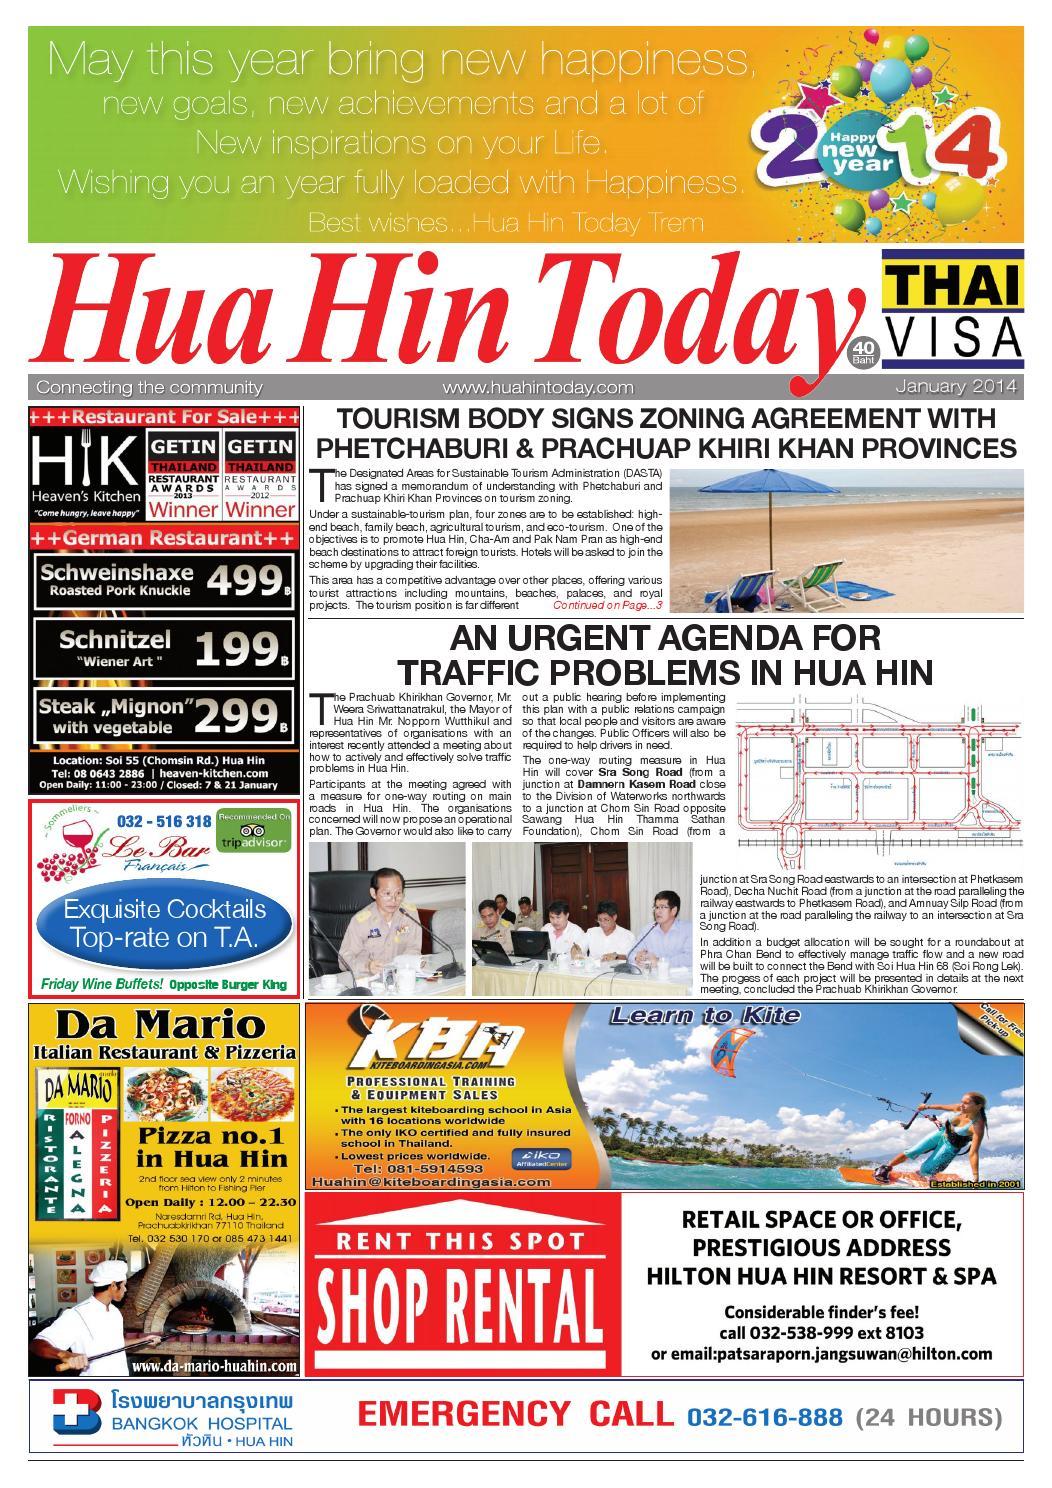 Newspaper Hua Hin Today January 2014 by Hua Hin Today - issuu